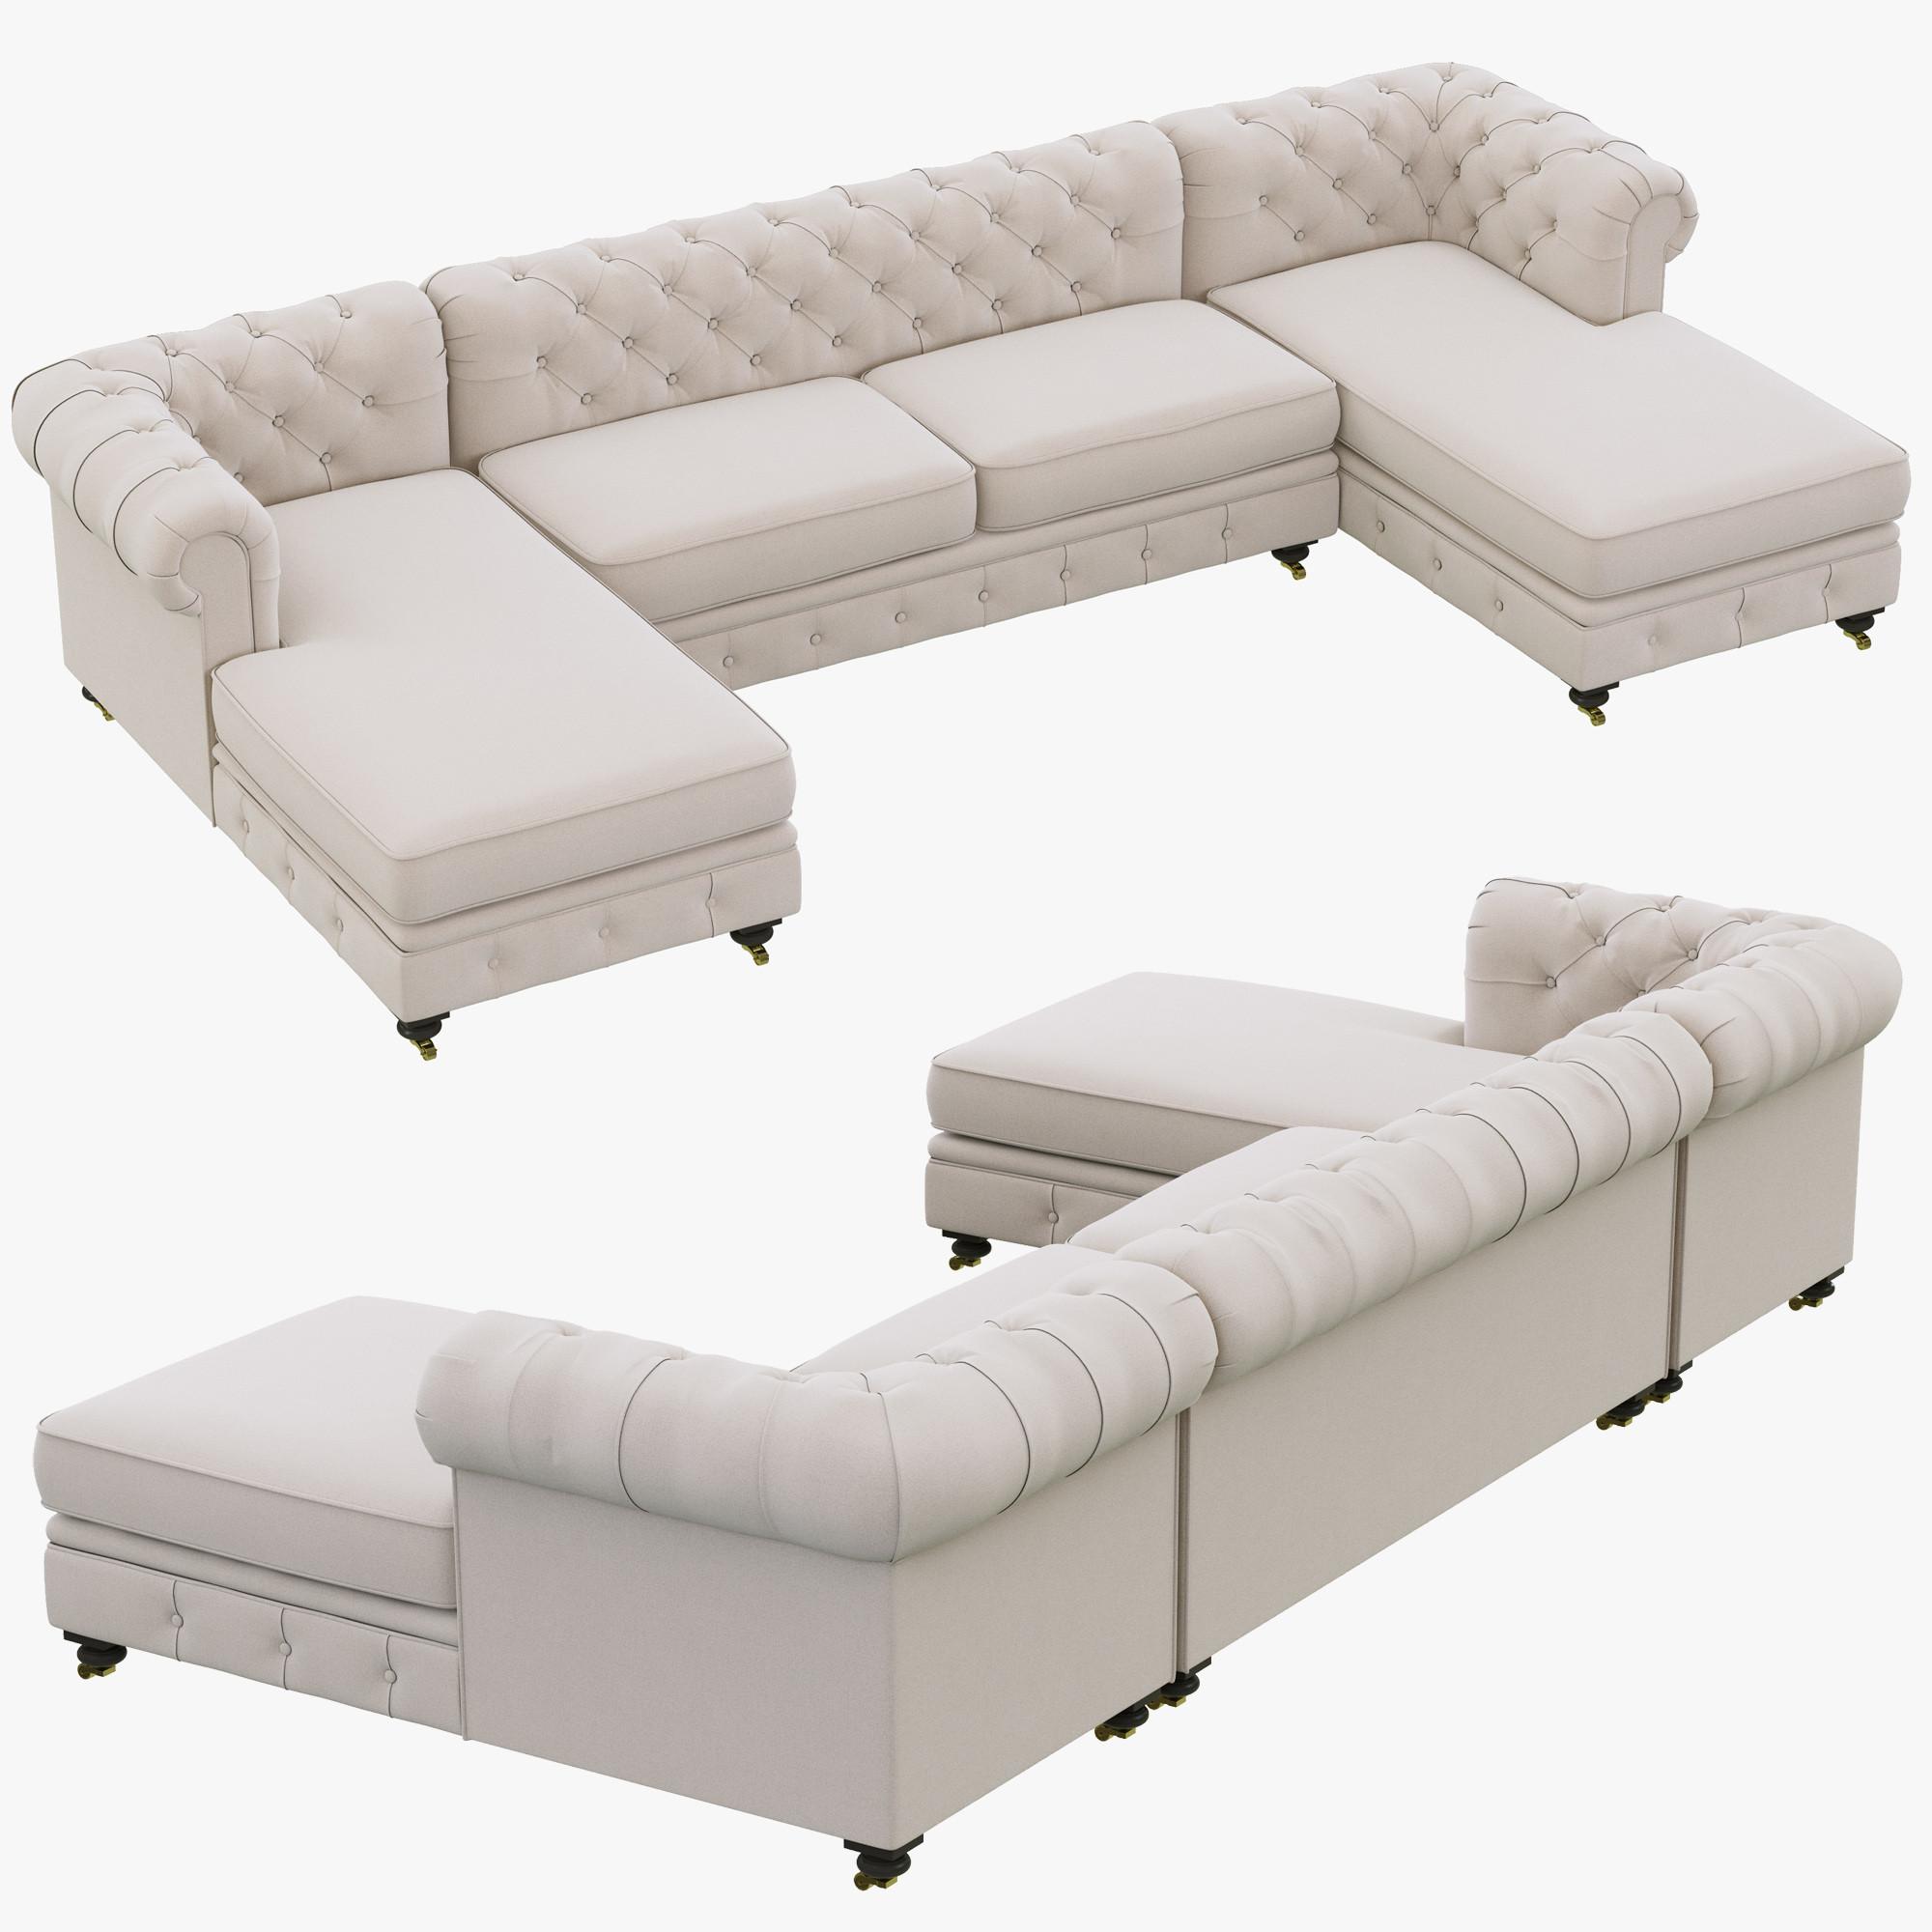 restoration hardware kensington upholstered u chaise